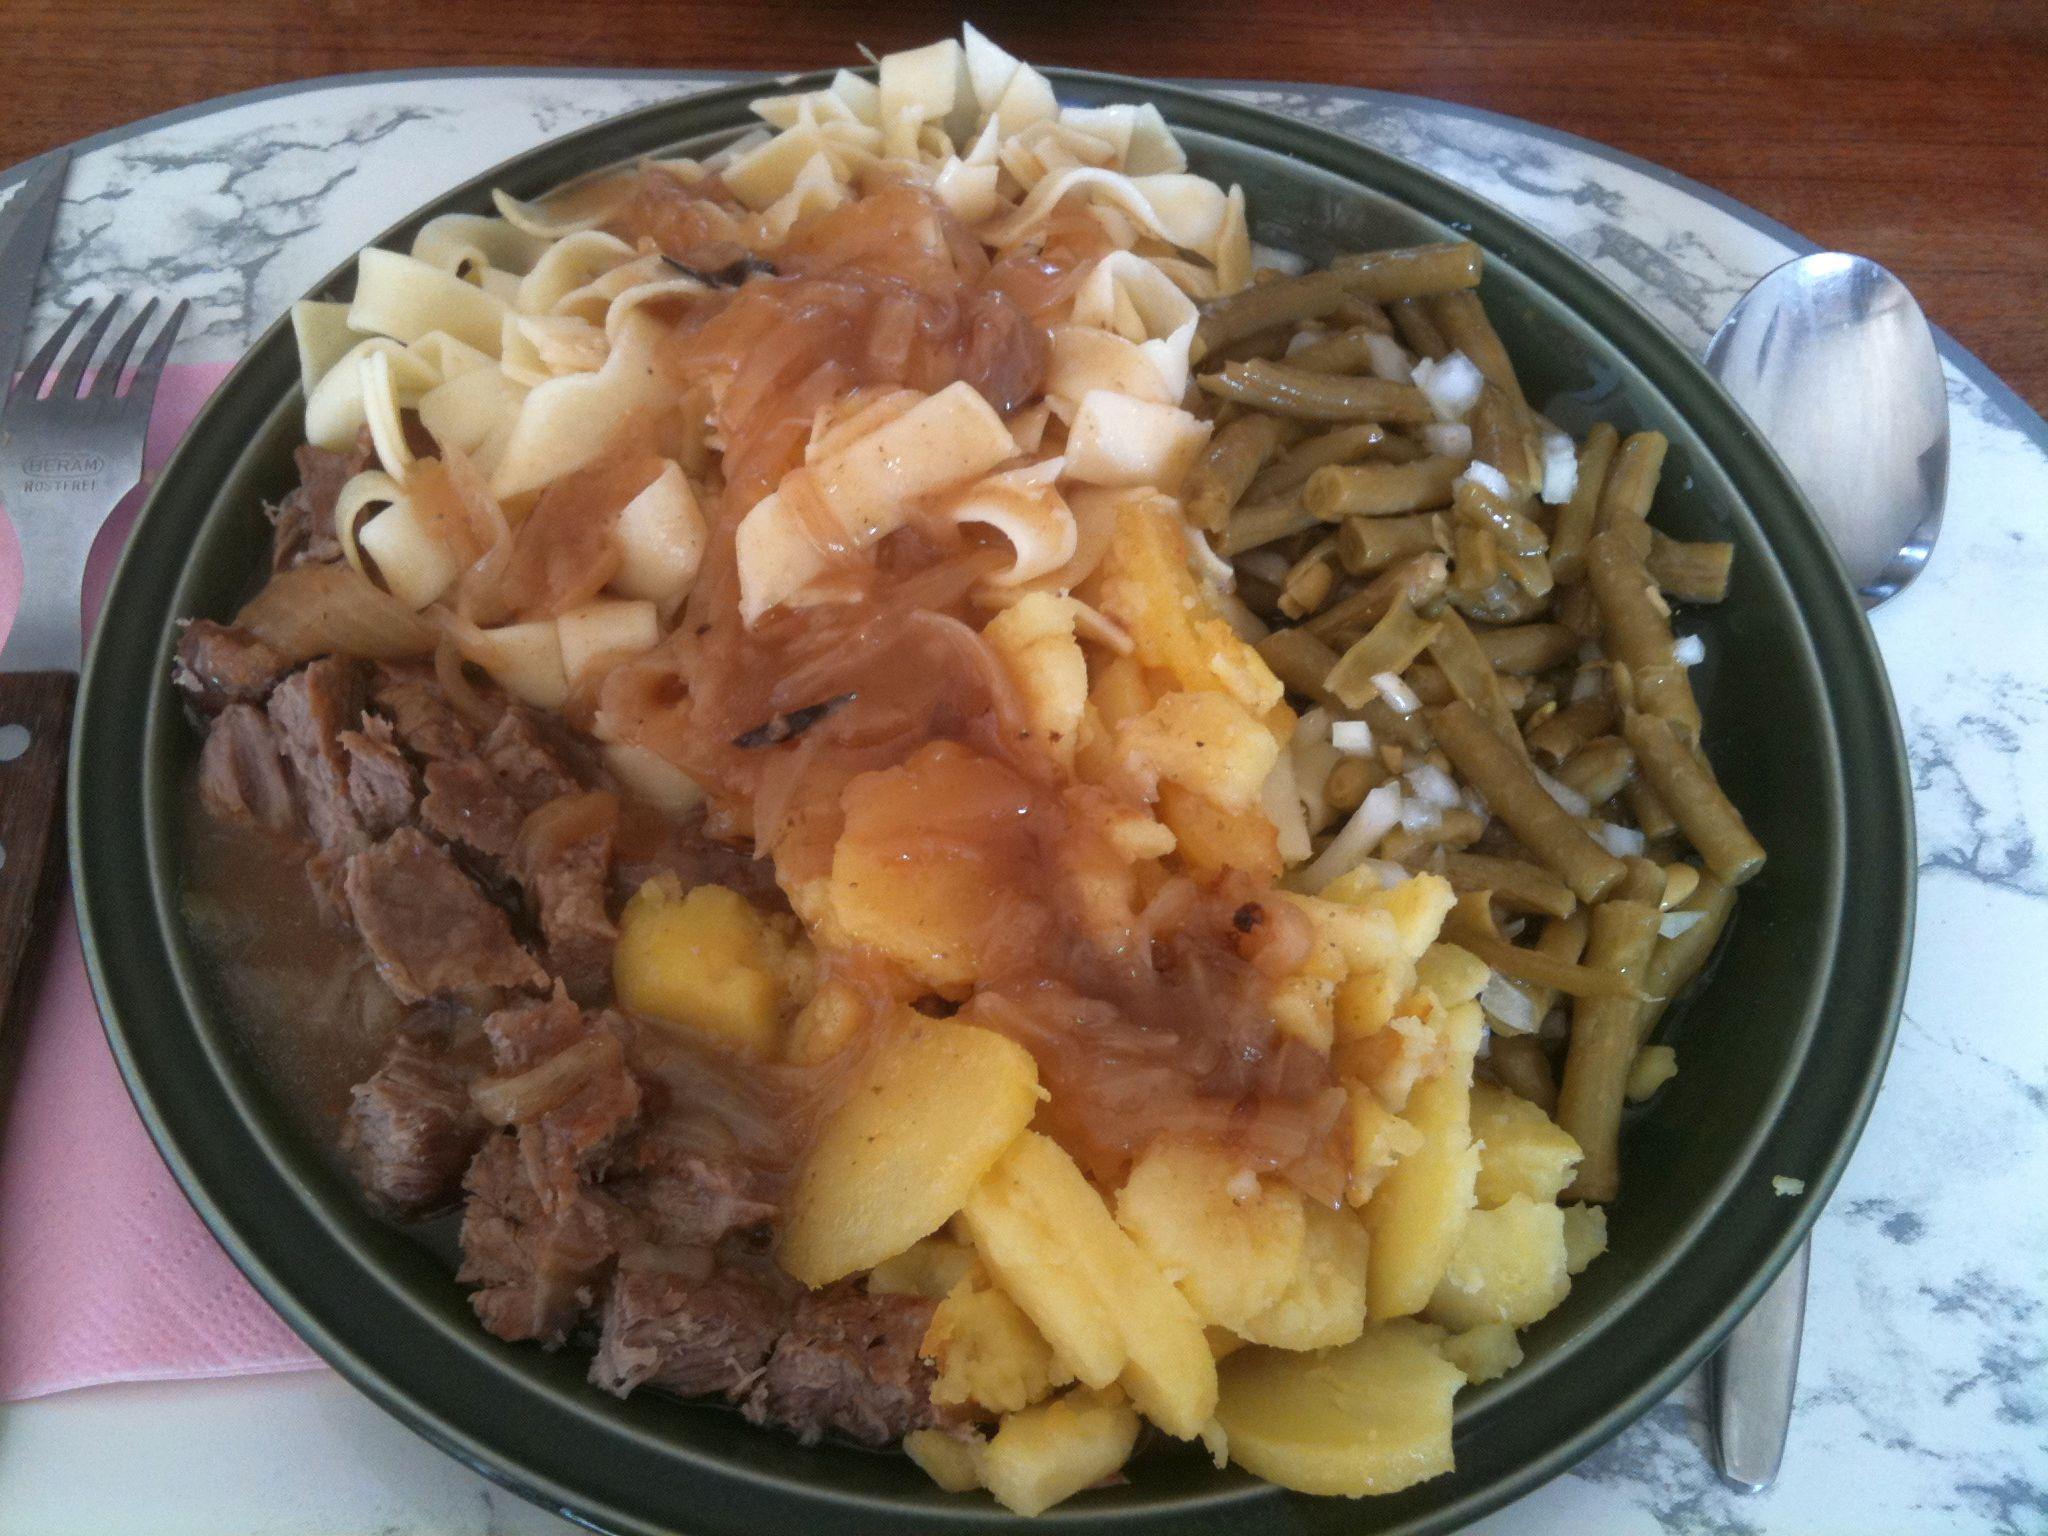 https://foodloader.net/nico_2011-08-17_rostbraten-bratkartoffeln-nudeln-bohnensalat.jpg